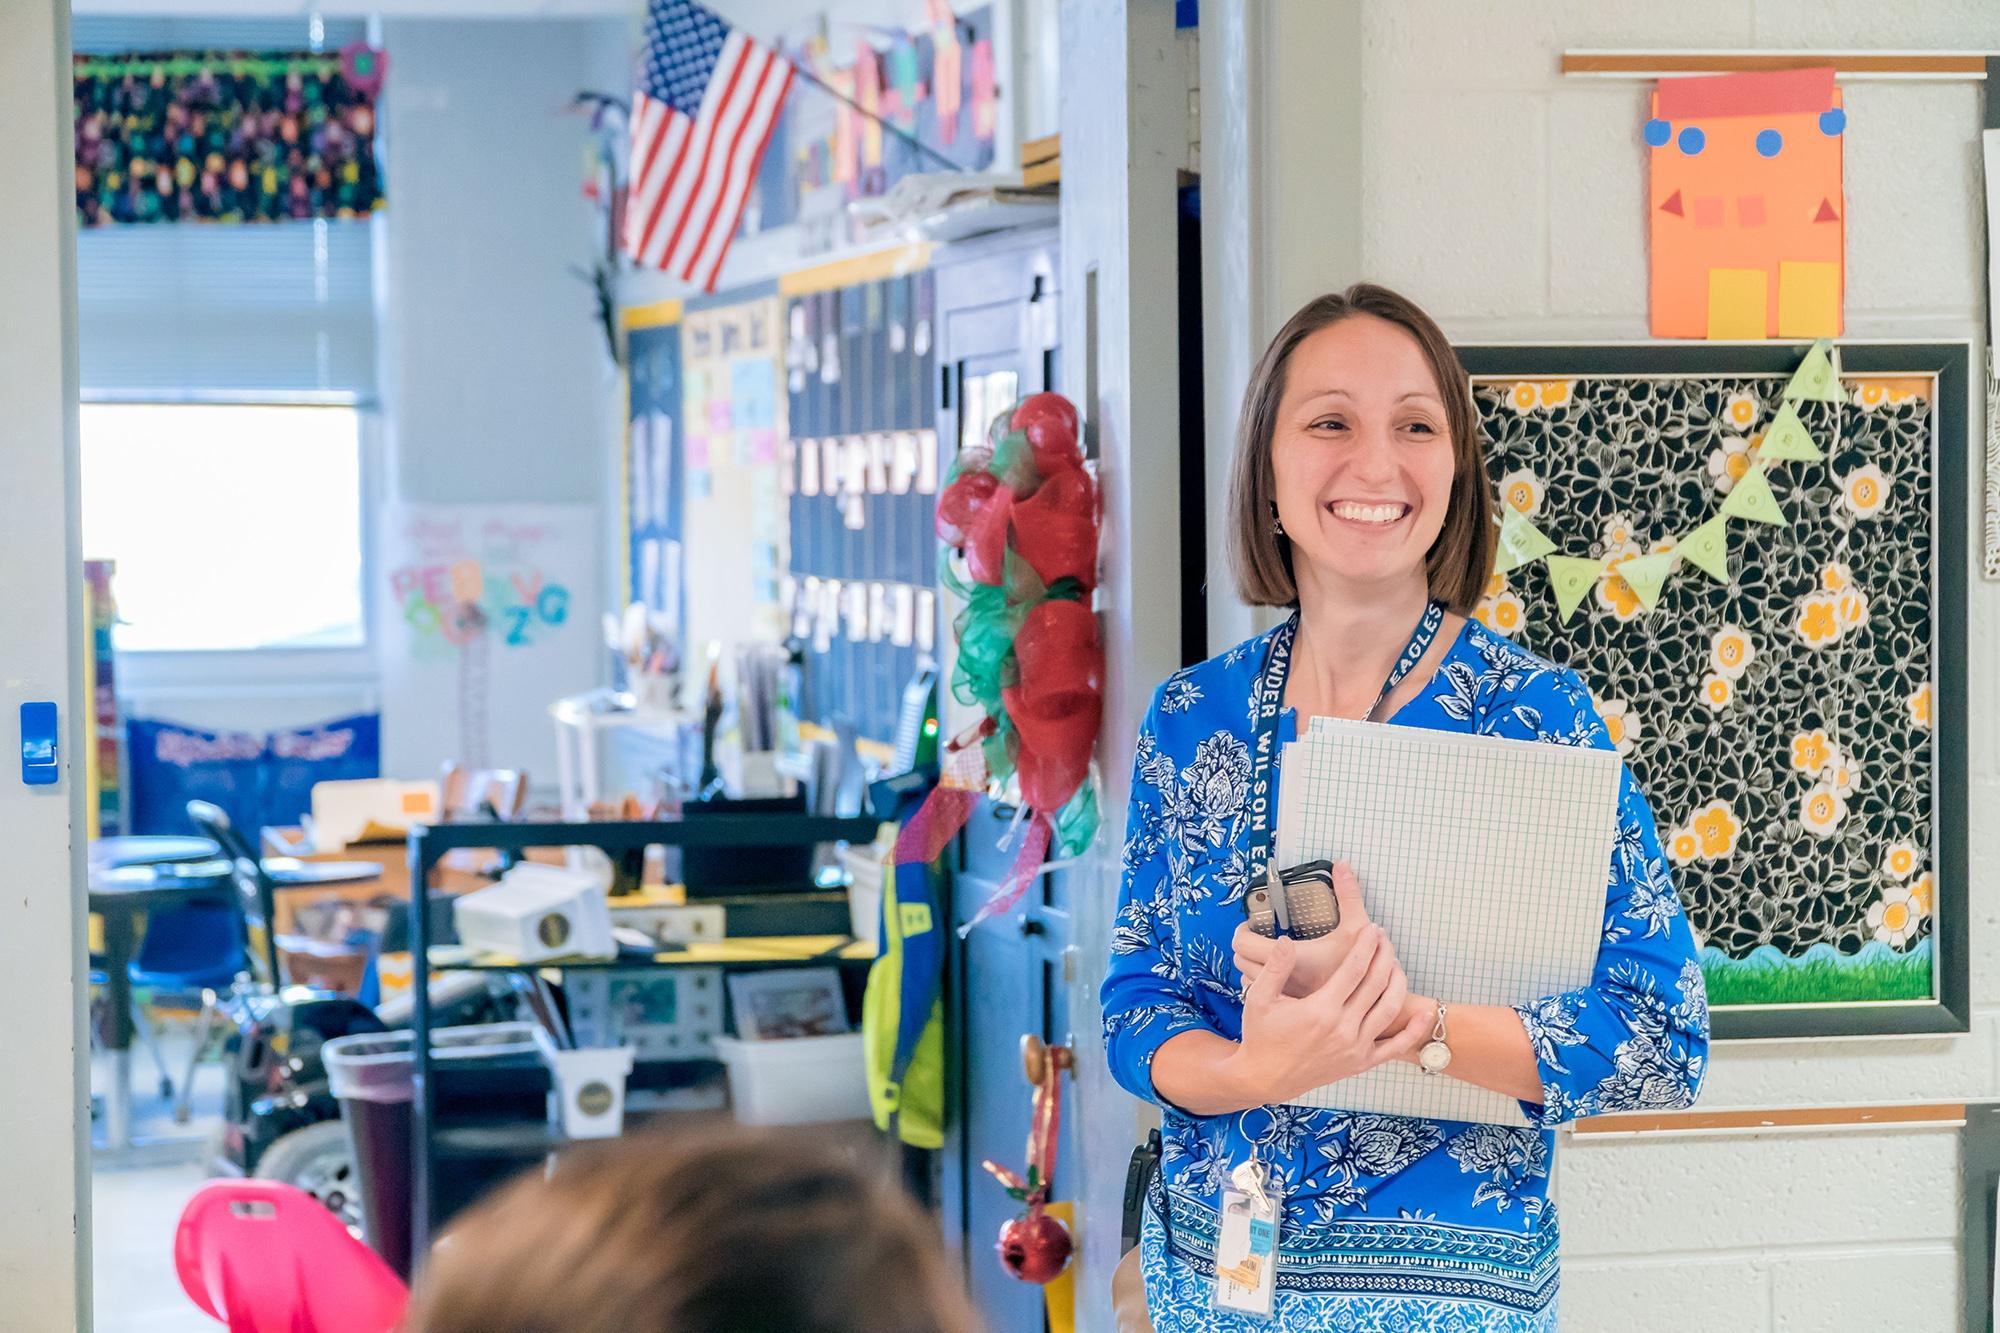 Alamance teacher outside a classroom